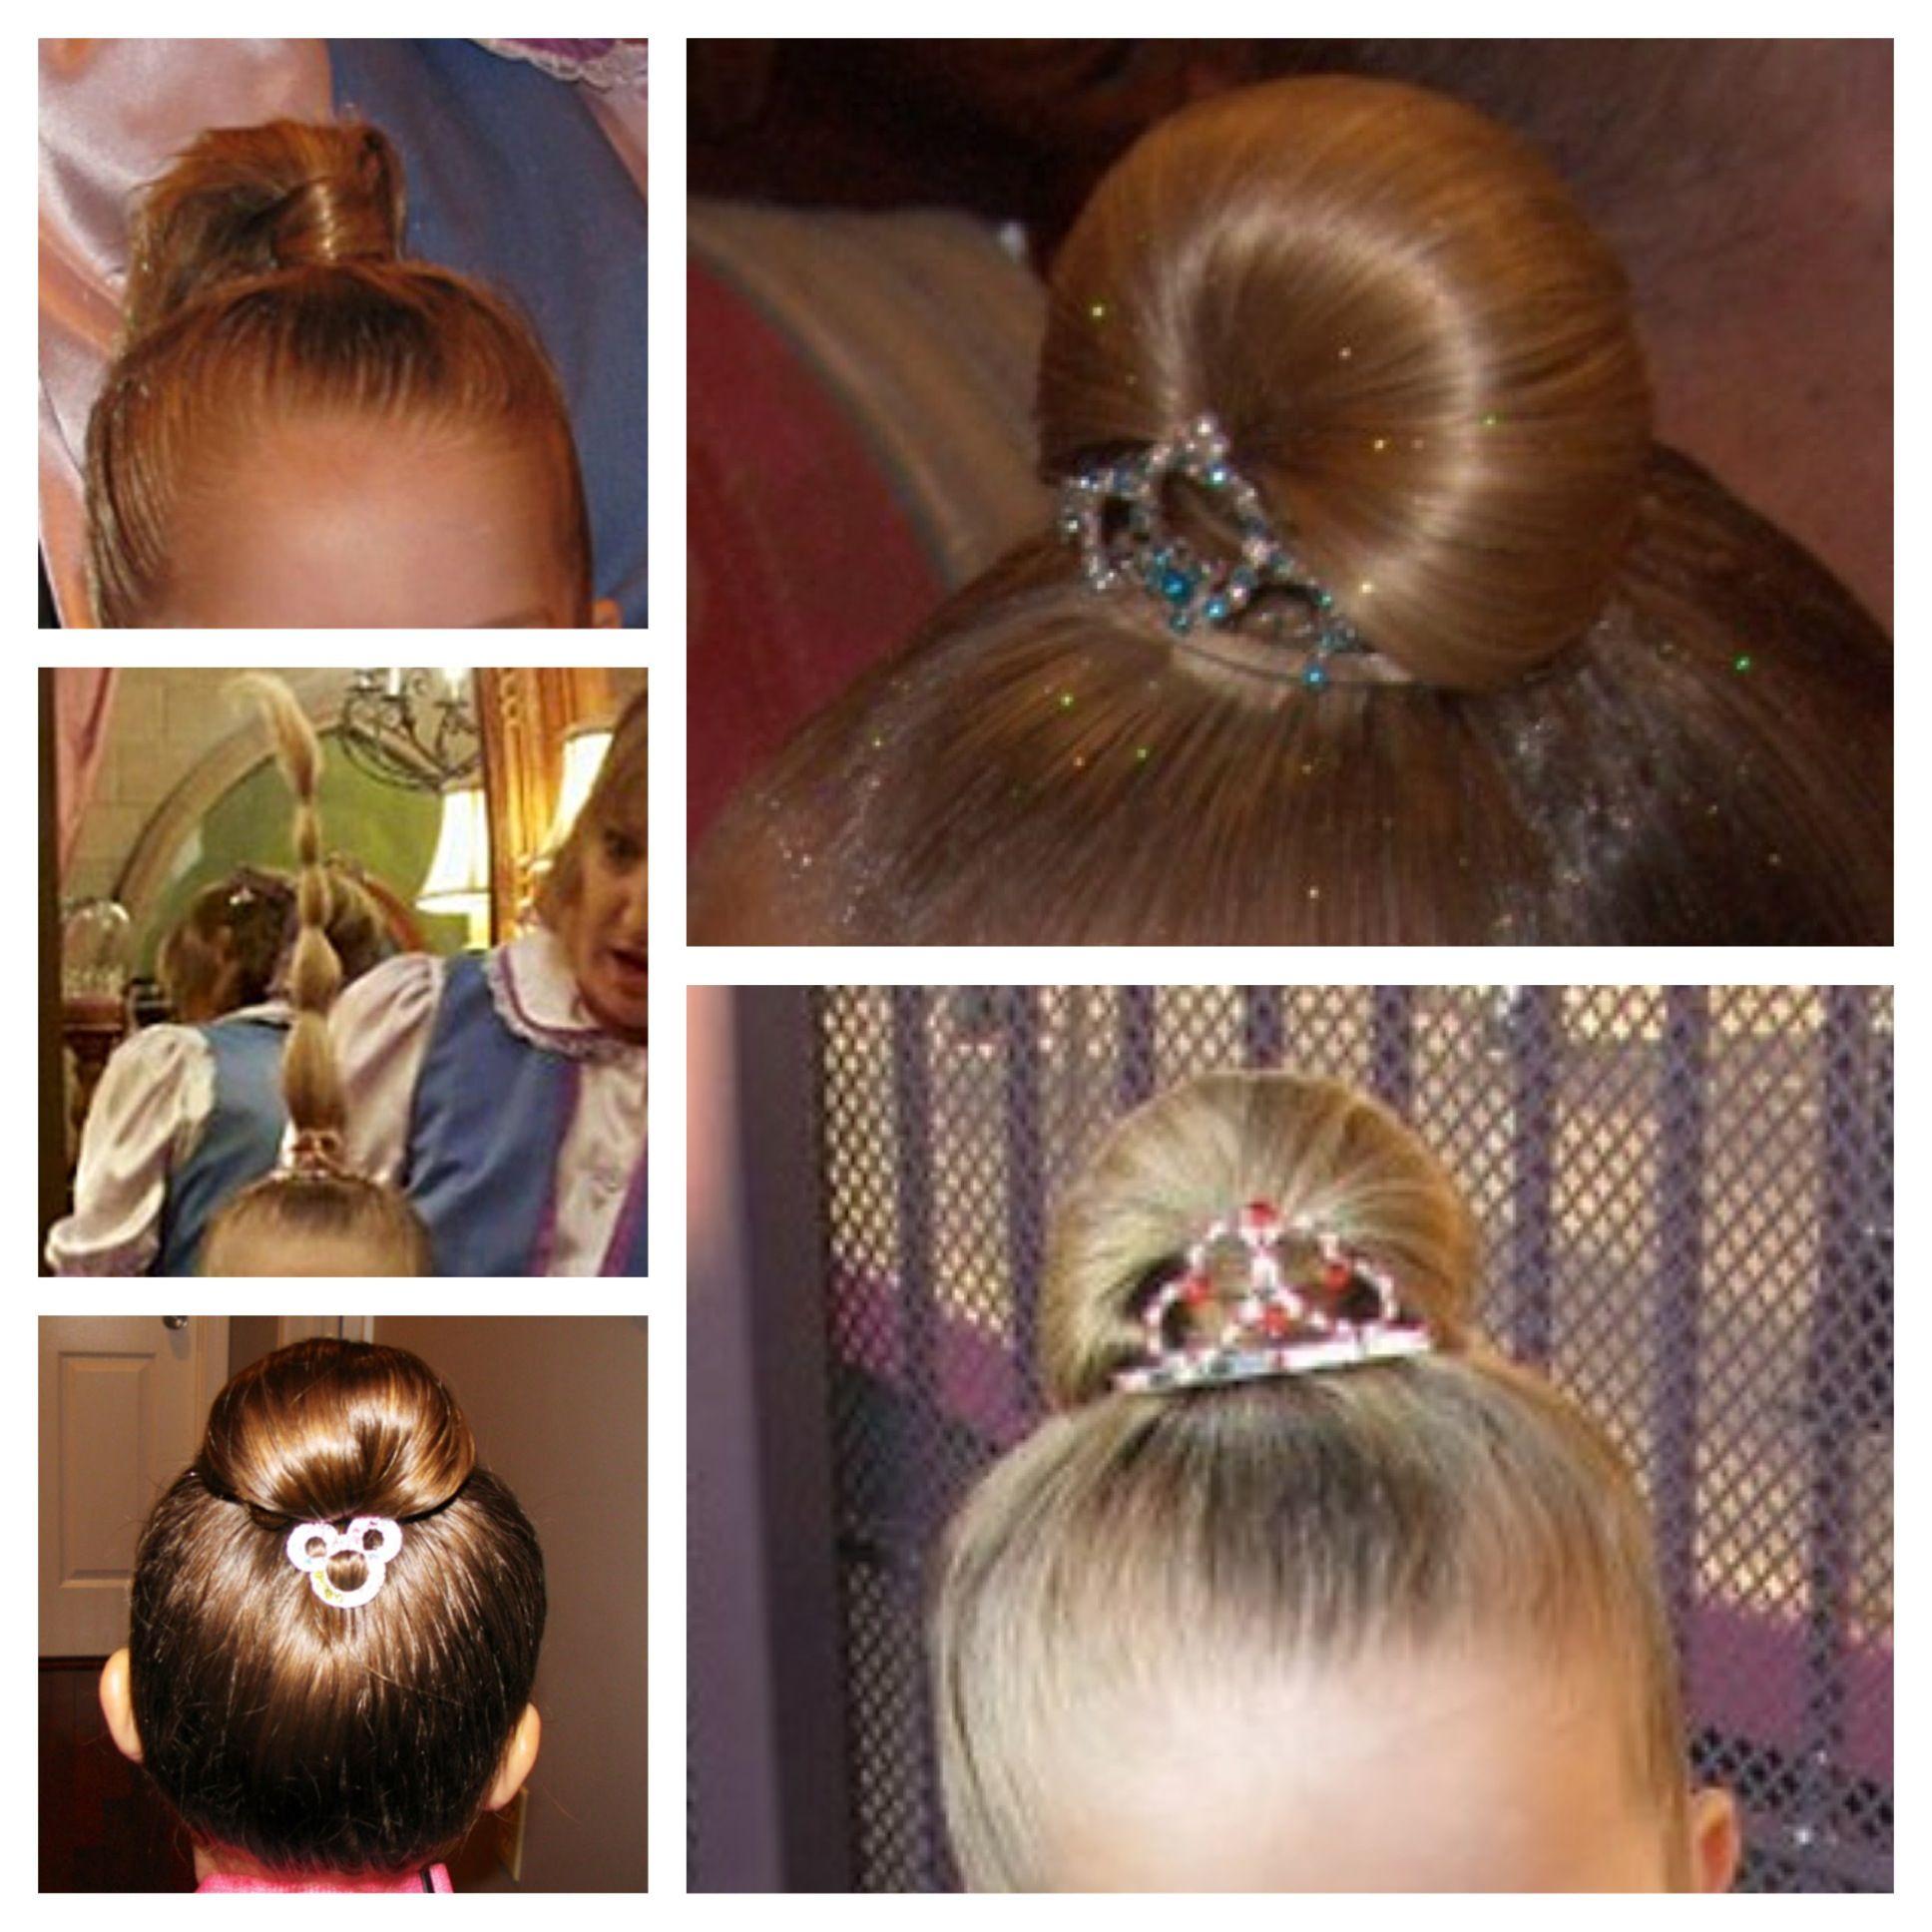 You can style the Bibbidi Bobbidi Boutique fairytale princess hair